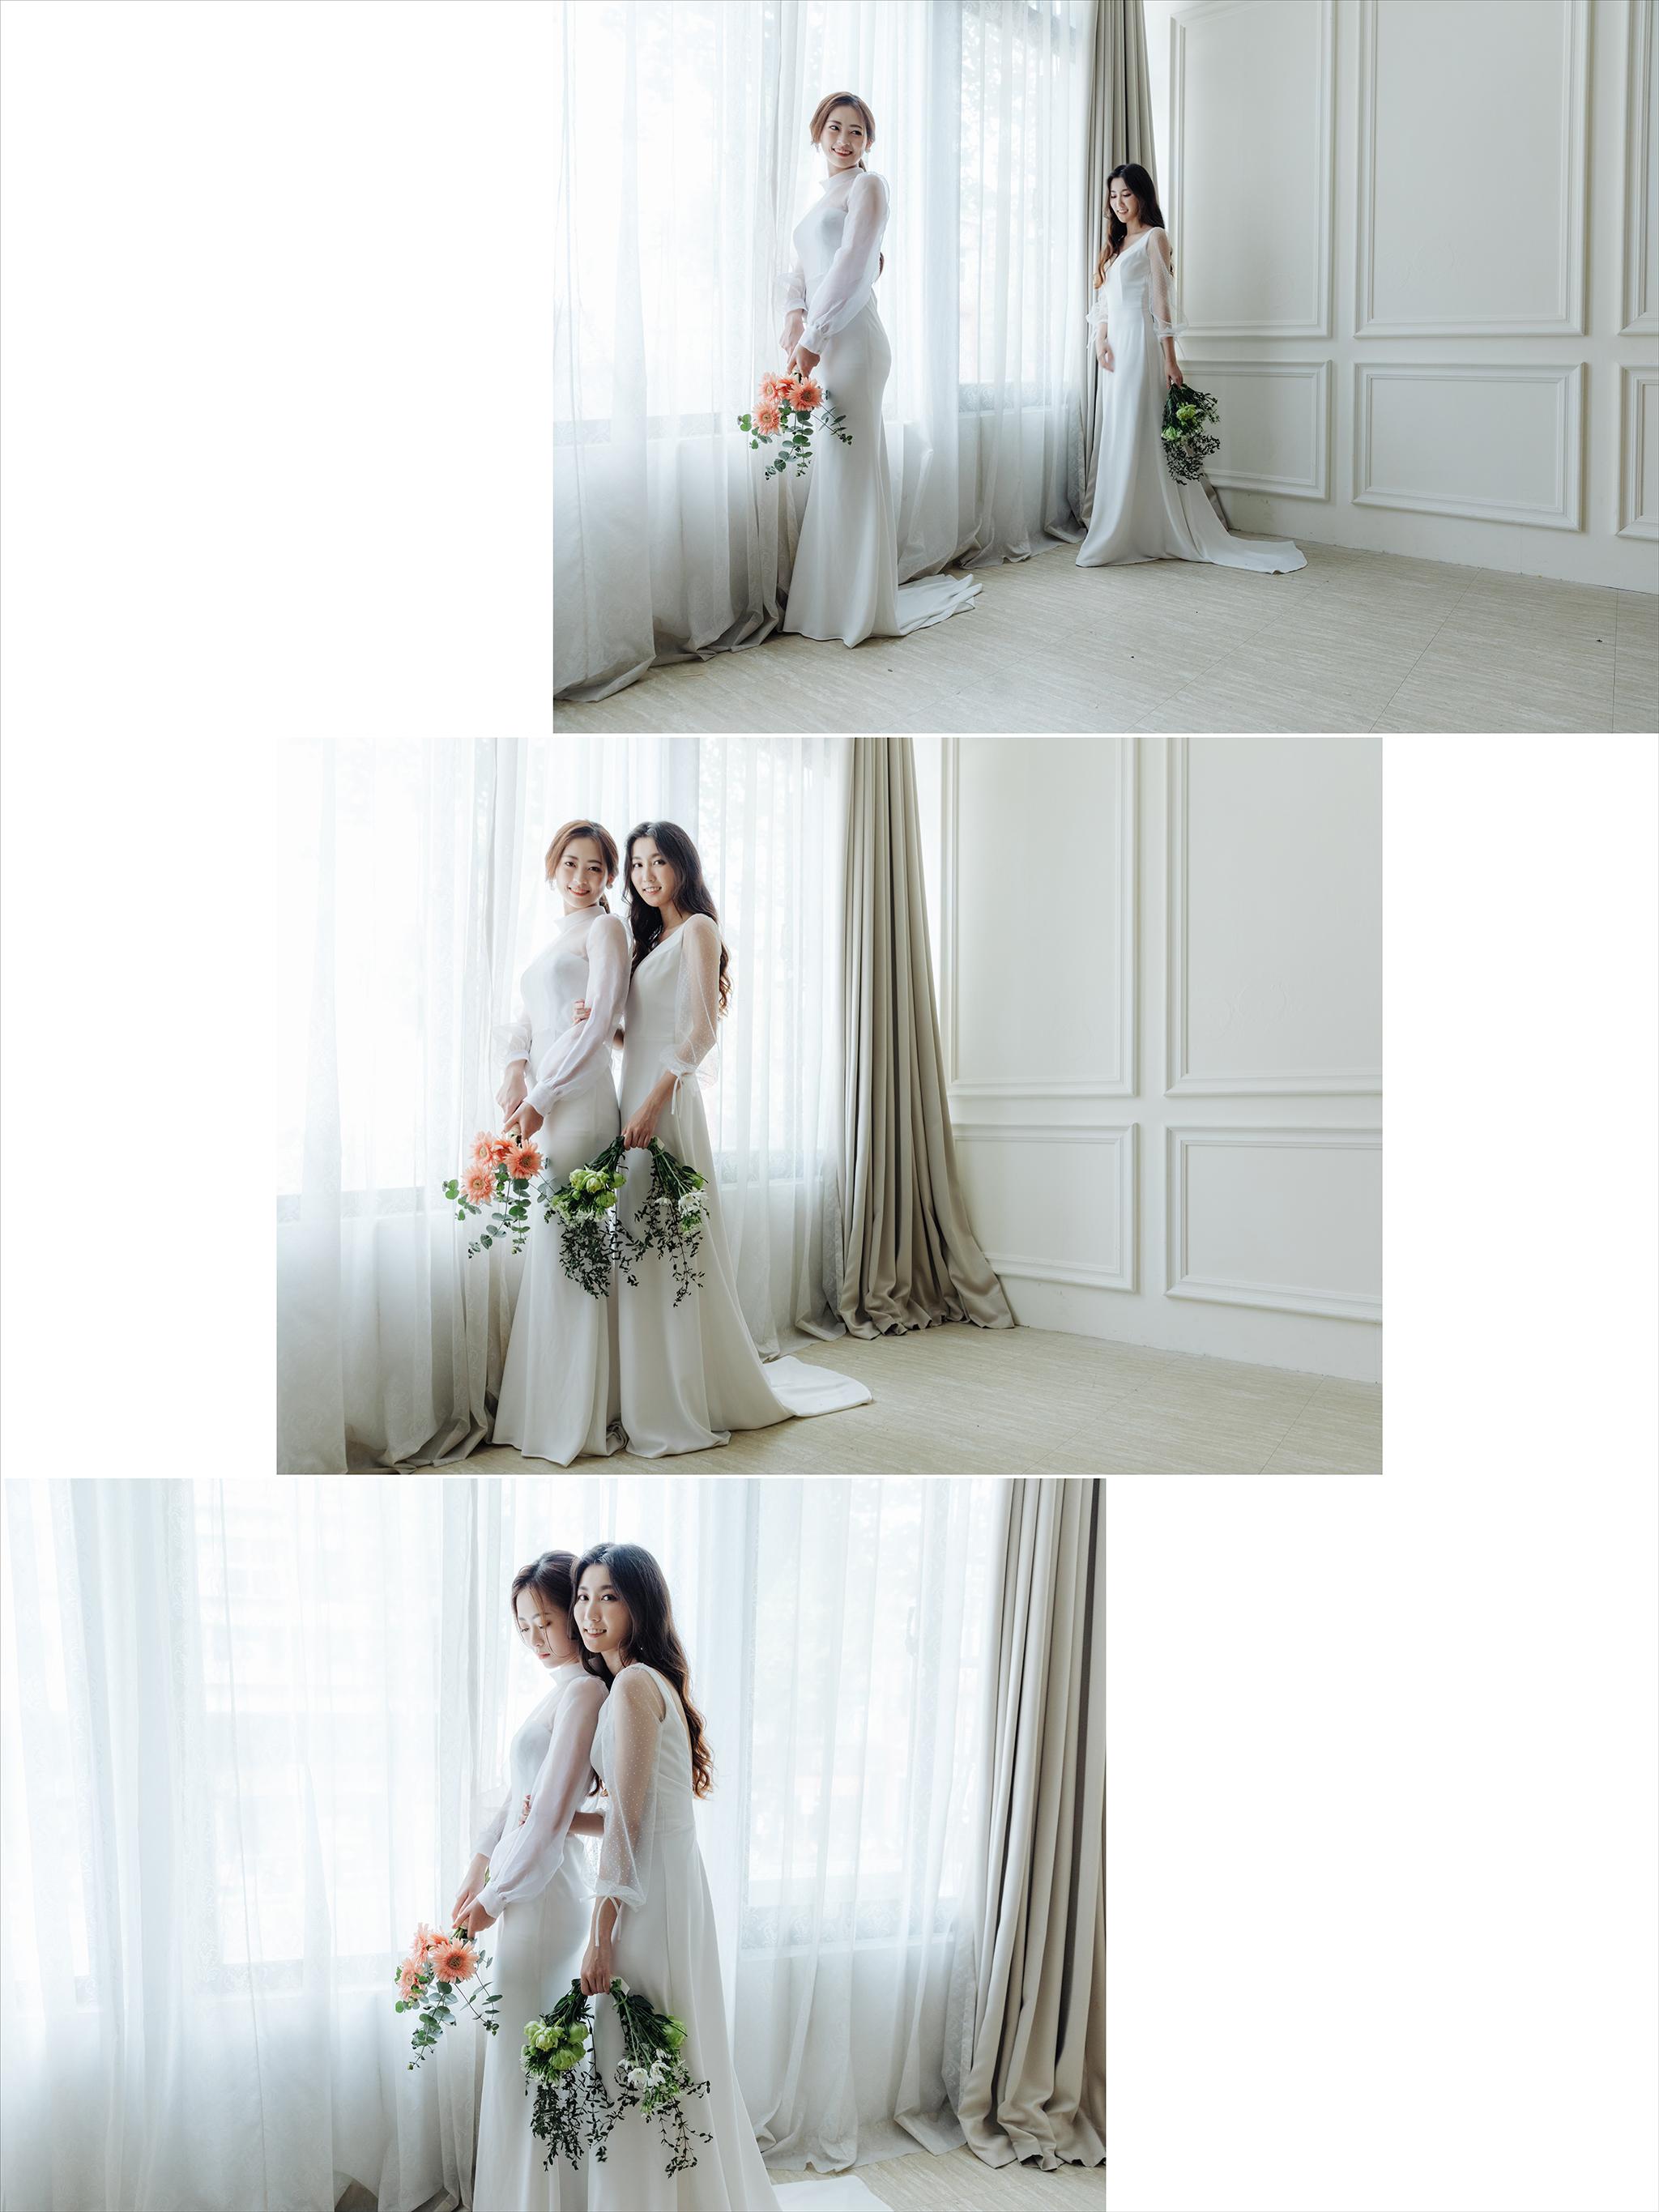 49929257751 2155de6d7e o - 【閨蜜婚紗】+Jessy & Tiffany+